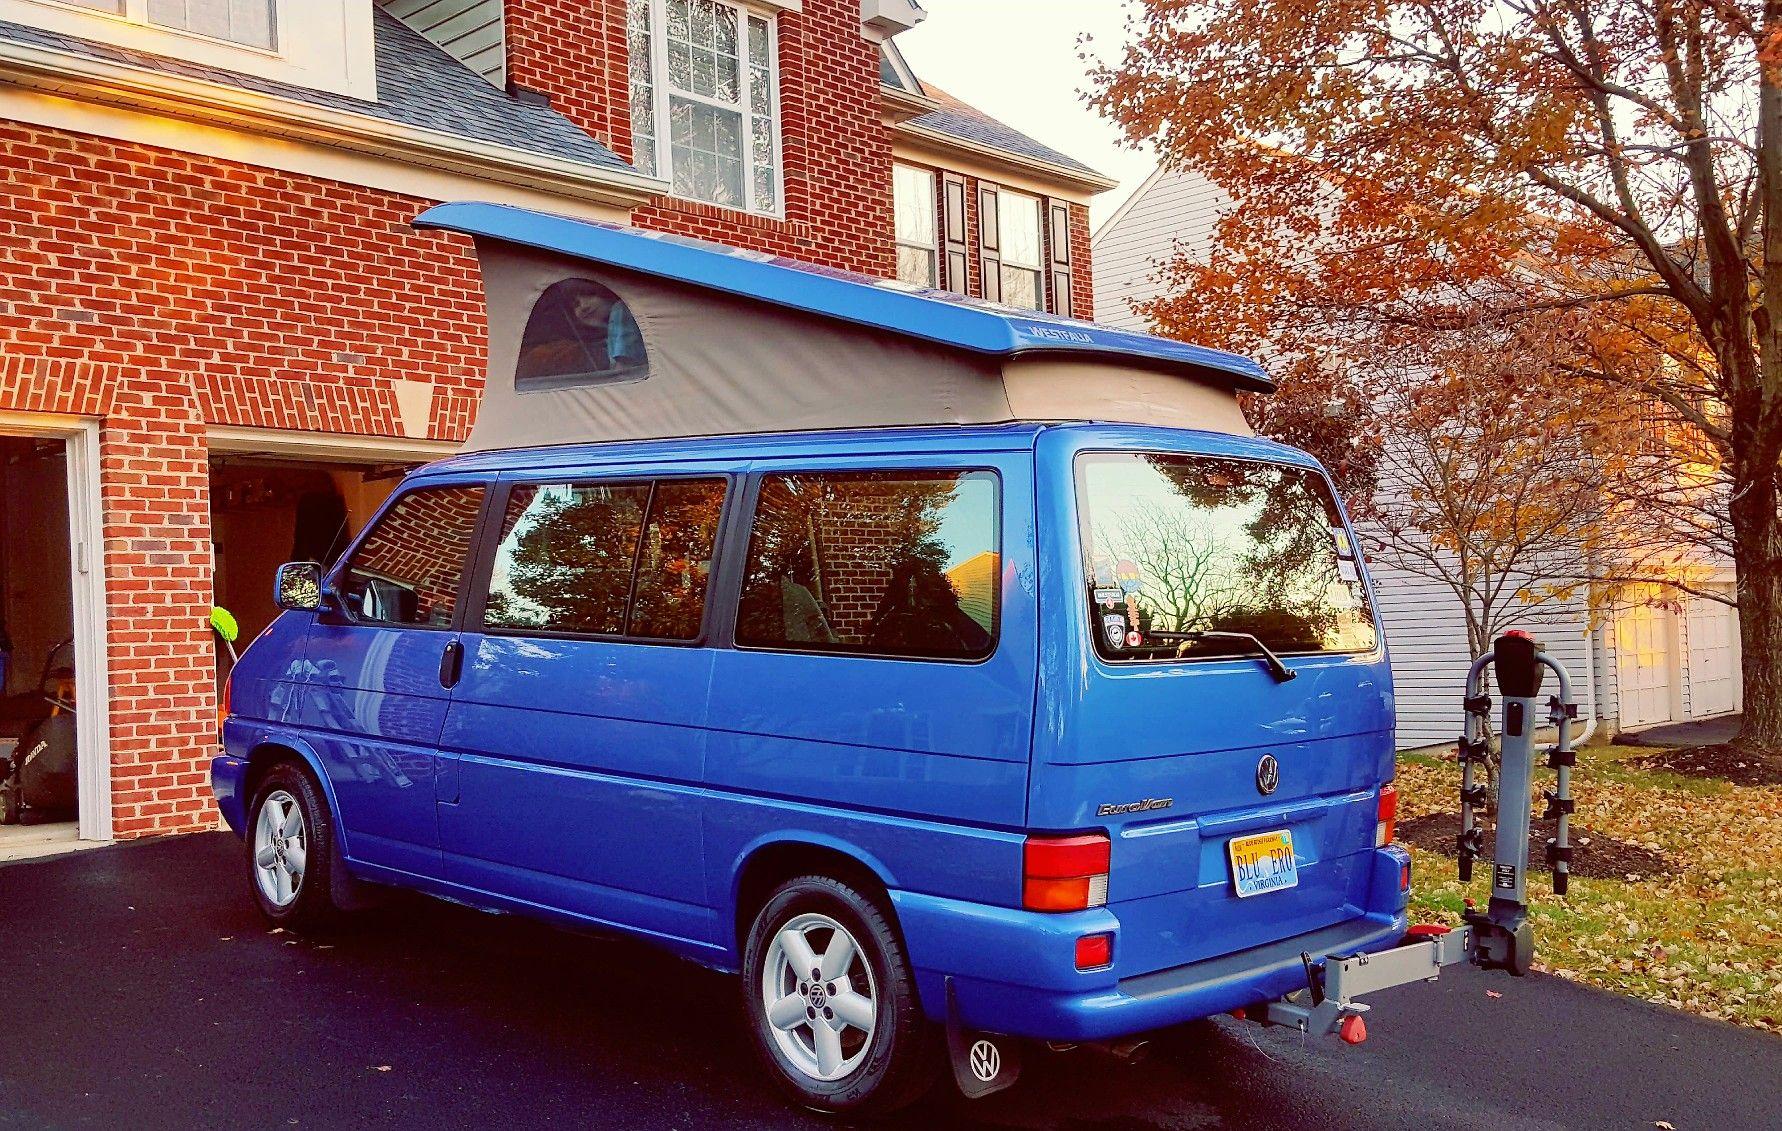 Just washed 2003 VW Eurovan Westfalia   VW Eurovan   Vehicles, Vans, Car